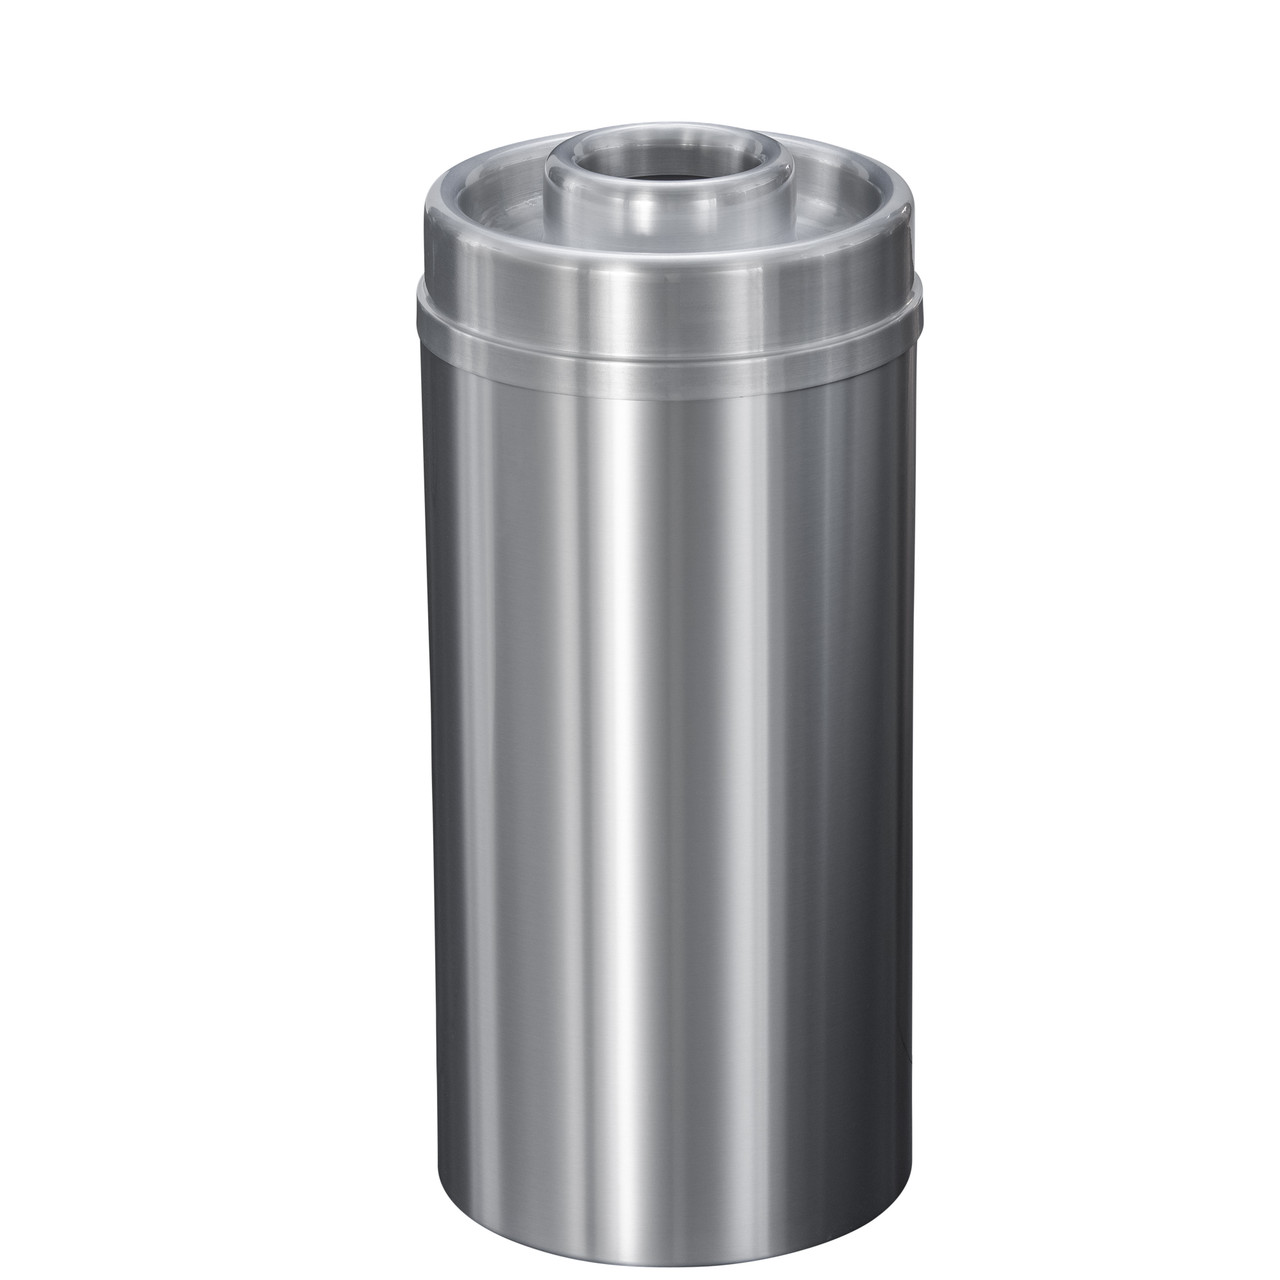 New Yorker 16 Gallon D1533SA Donut Top Ash Trash Receptacle w/Plastic Liner